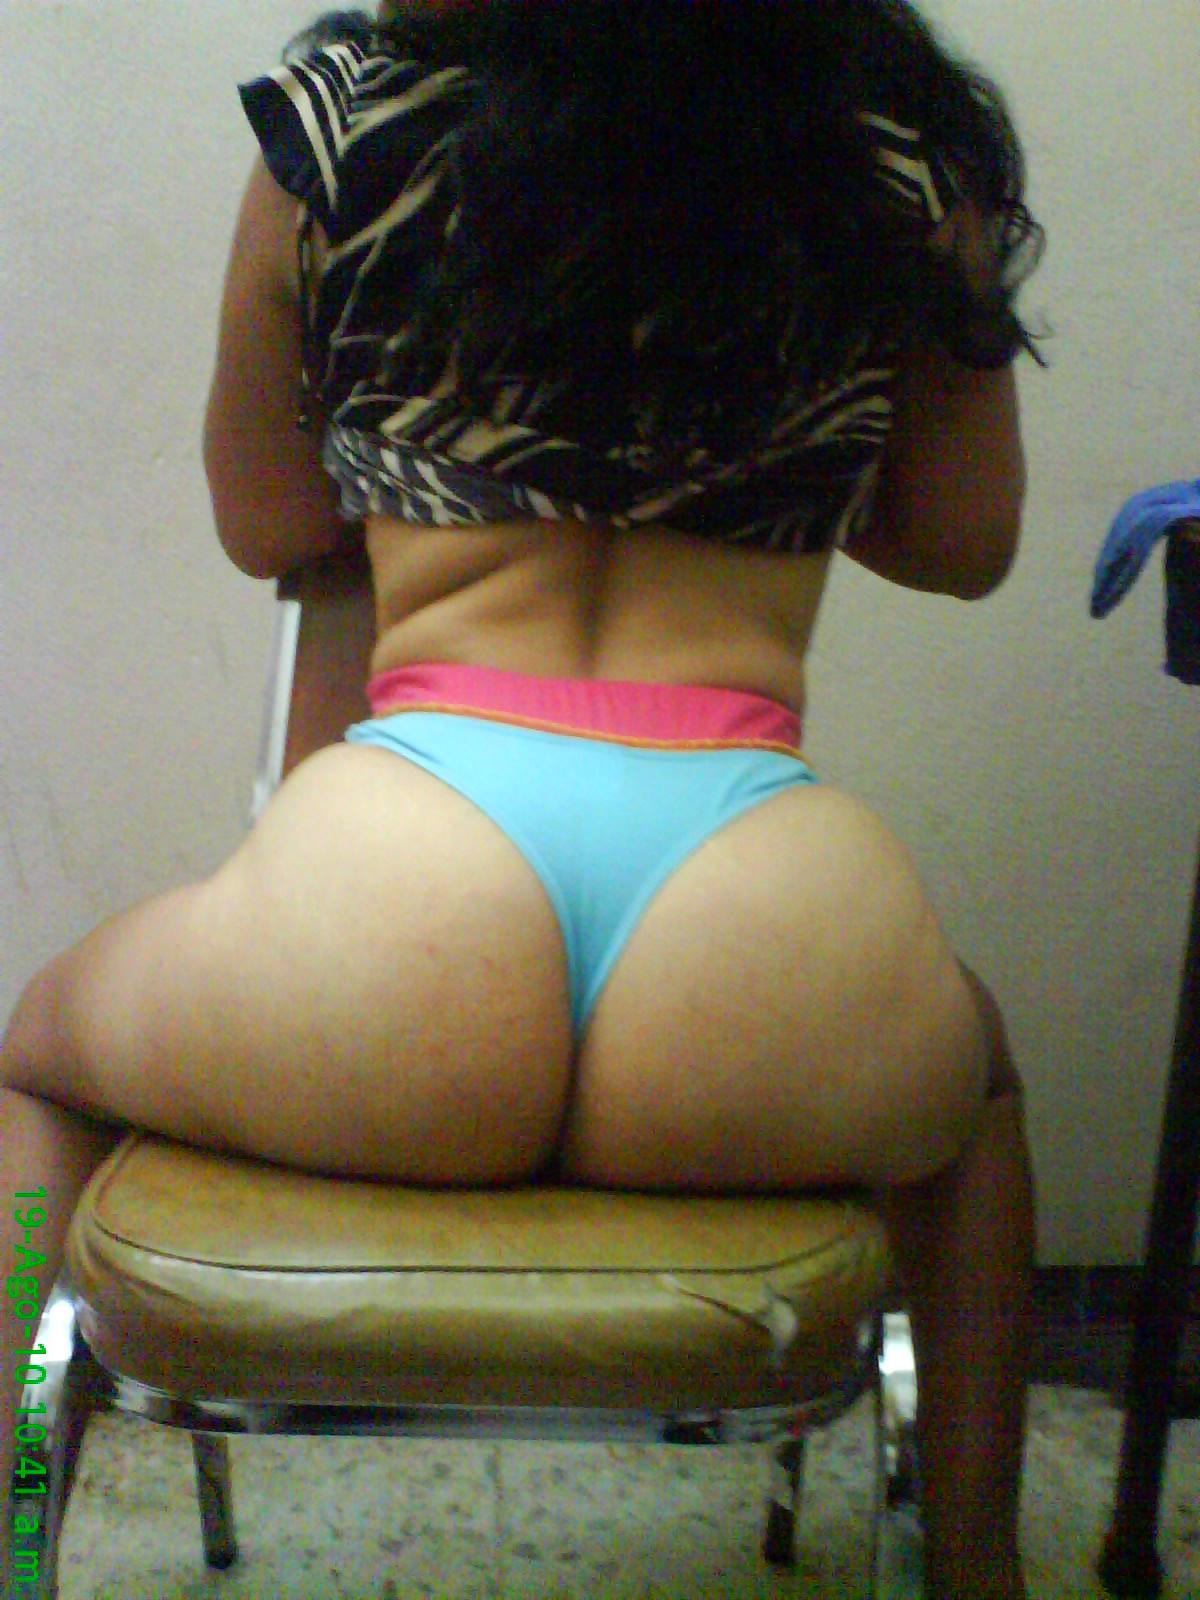 desvestirse www las mejores putas com